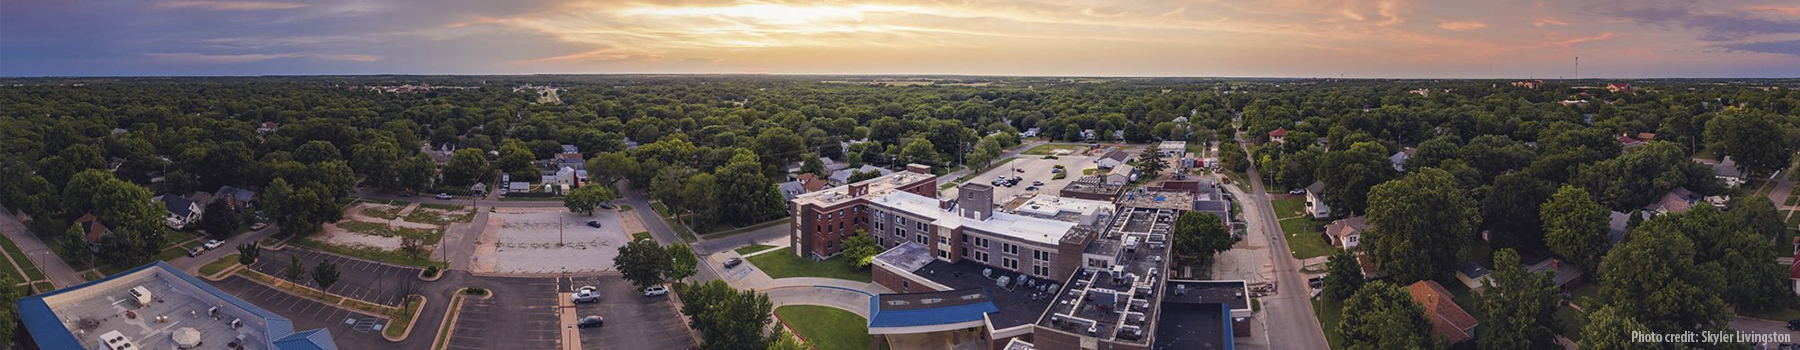 William Newton Hospital Aerial Skyler Livingston